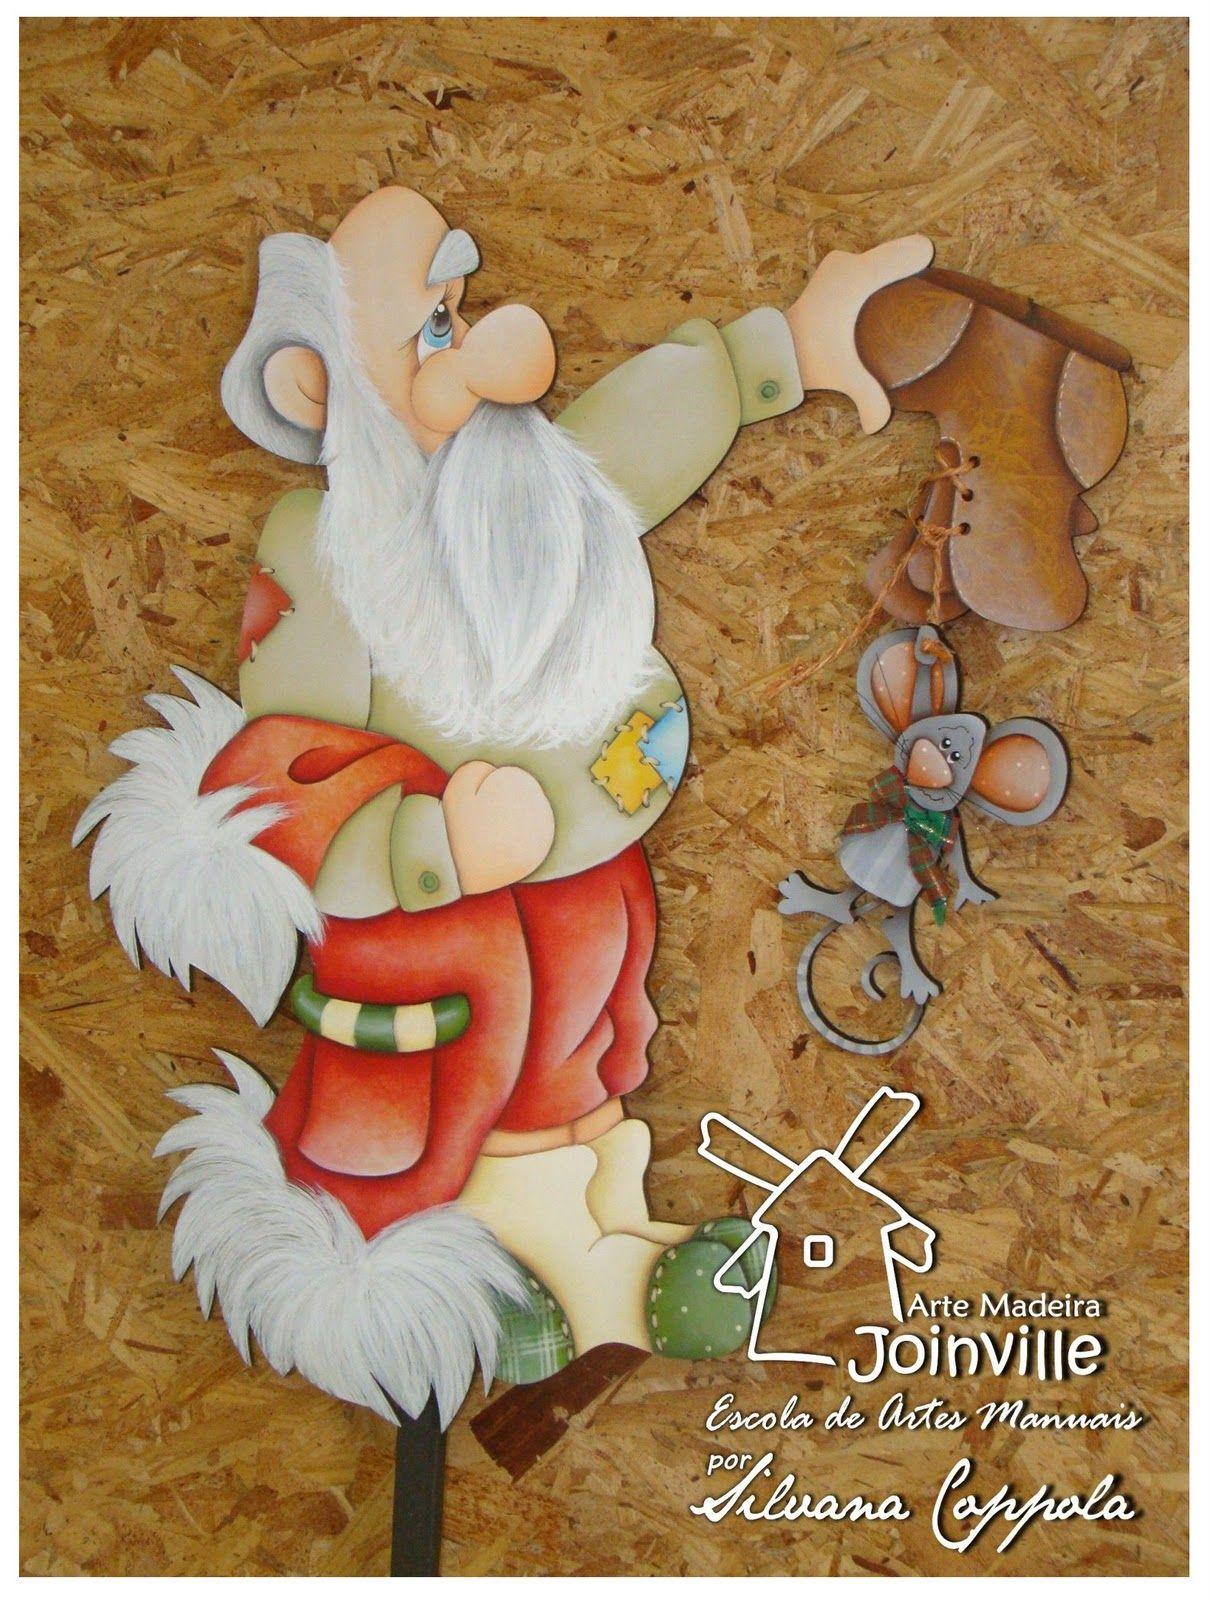 Armario Clothing Ghatkopar ~ Arte Madeira Joinville Natal 2011 Madera y Pintura Country Pinterest Arte madeira